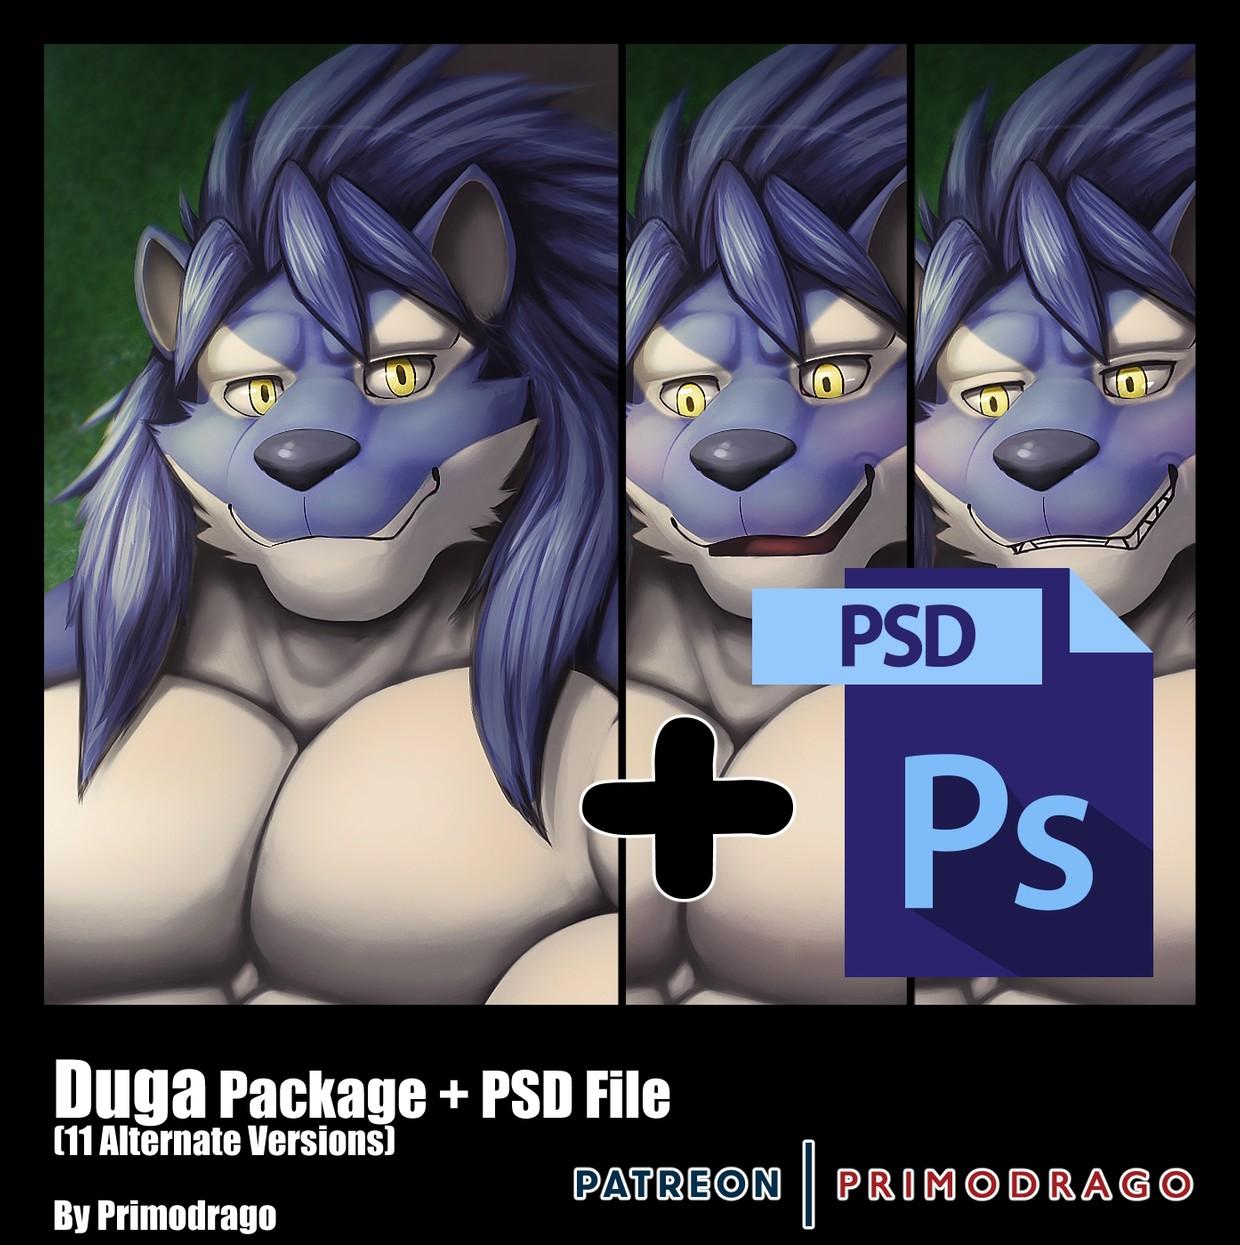 Duga Artpack + PSD File